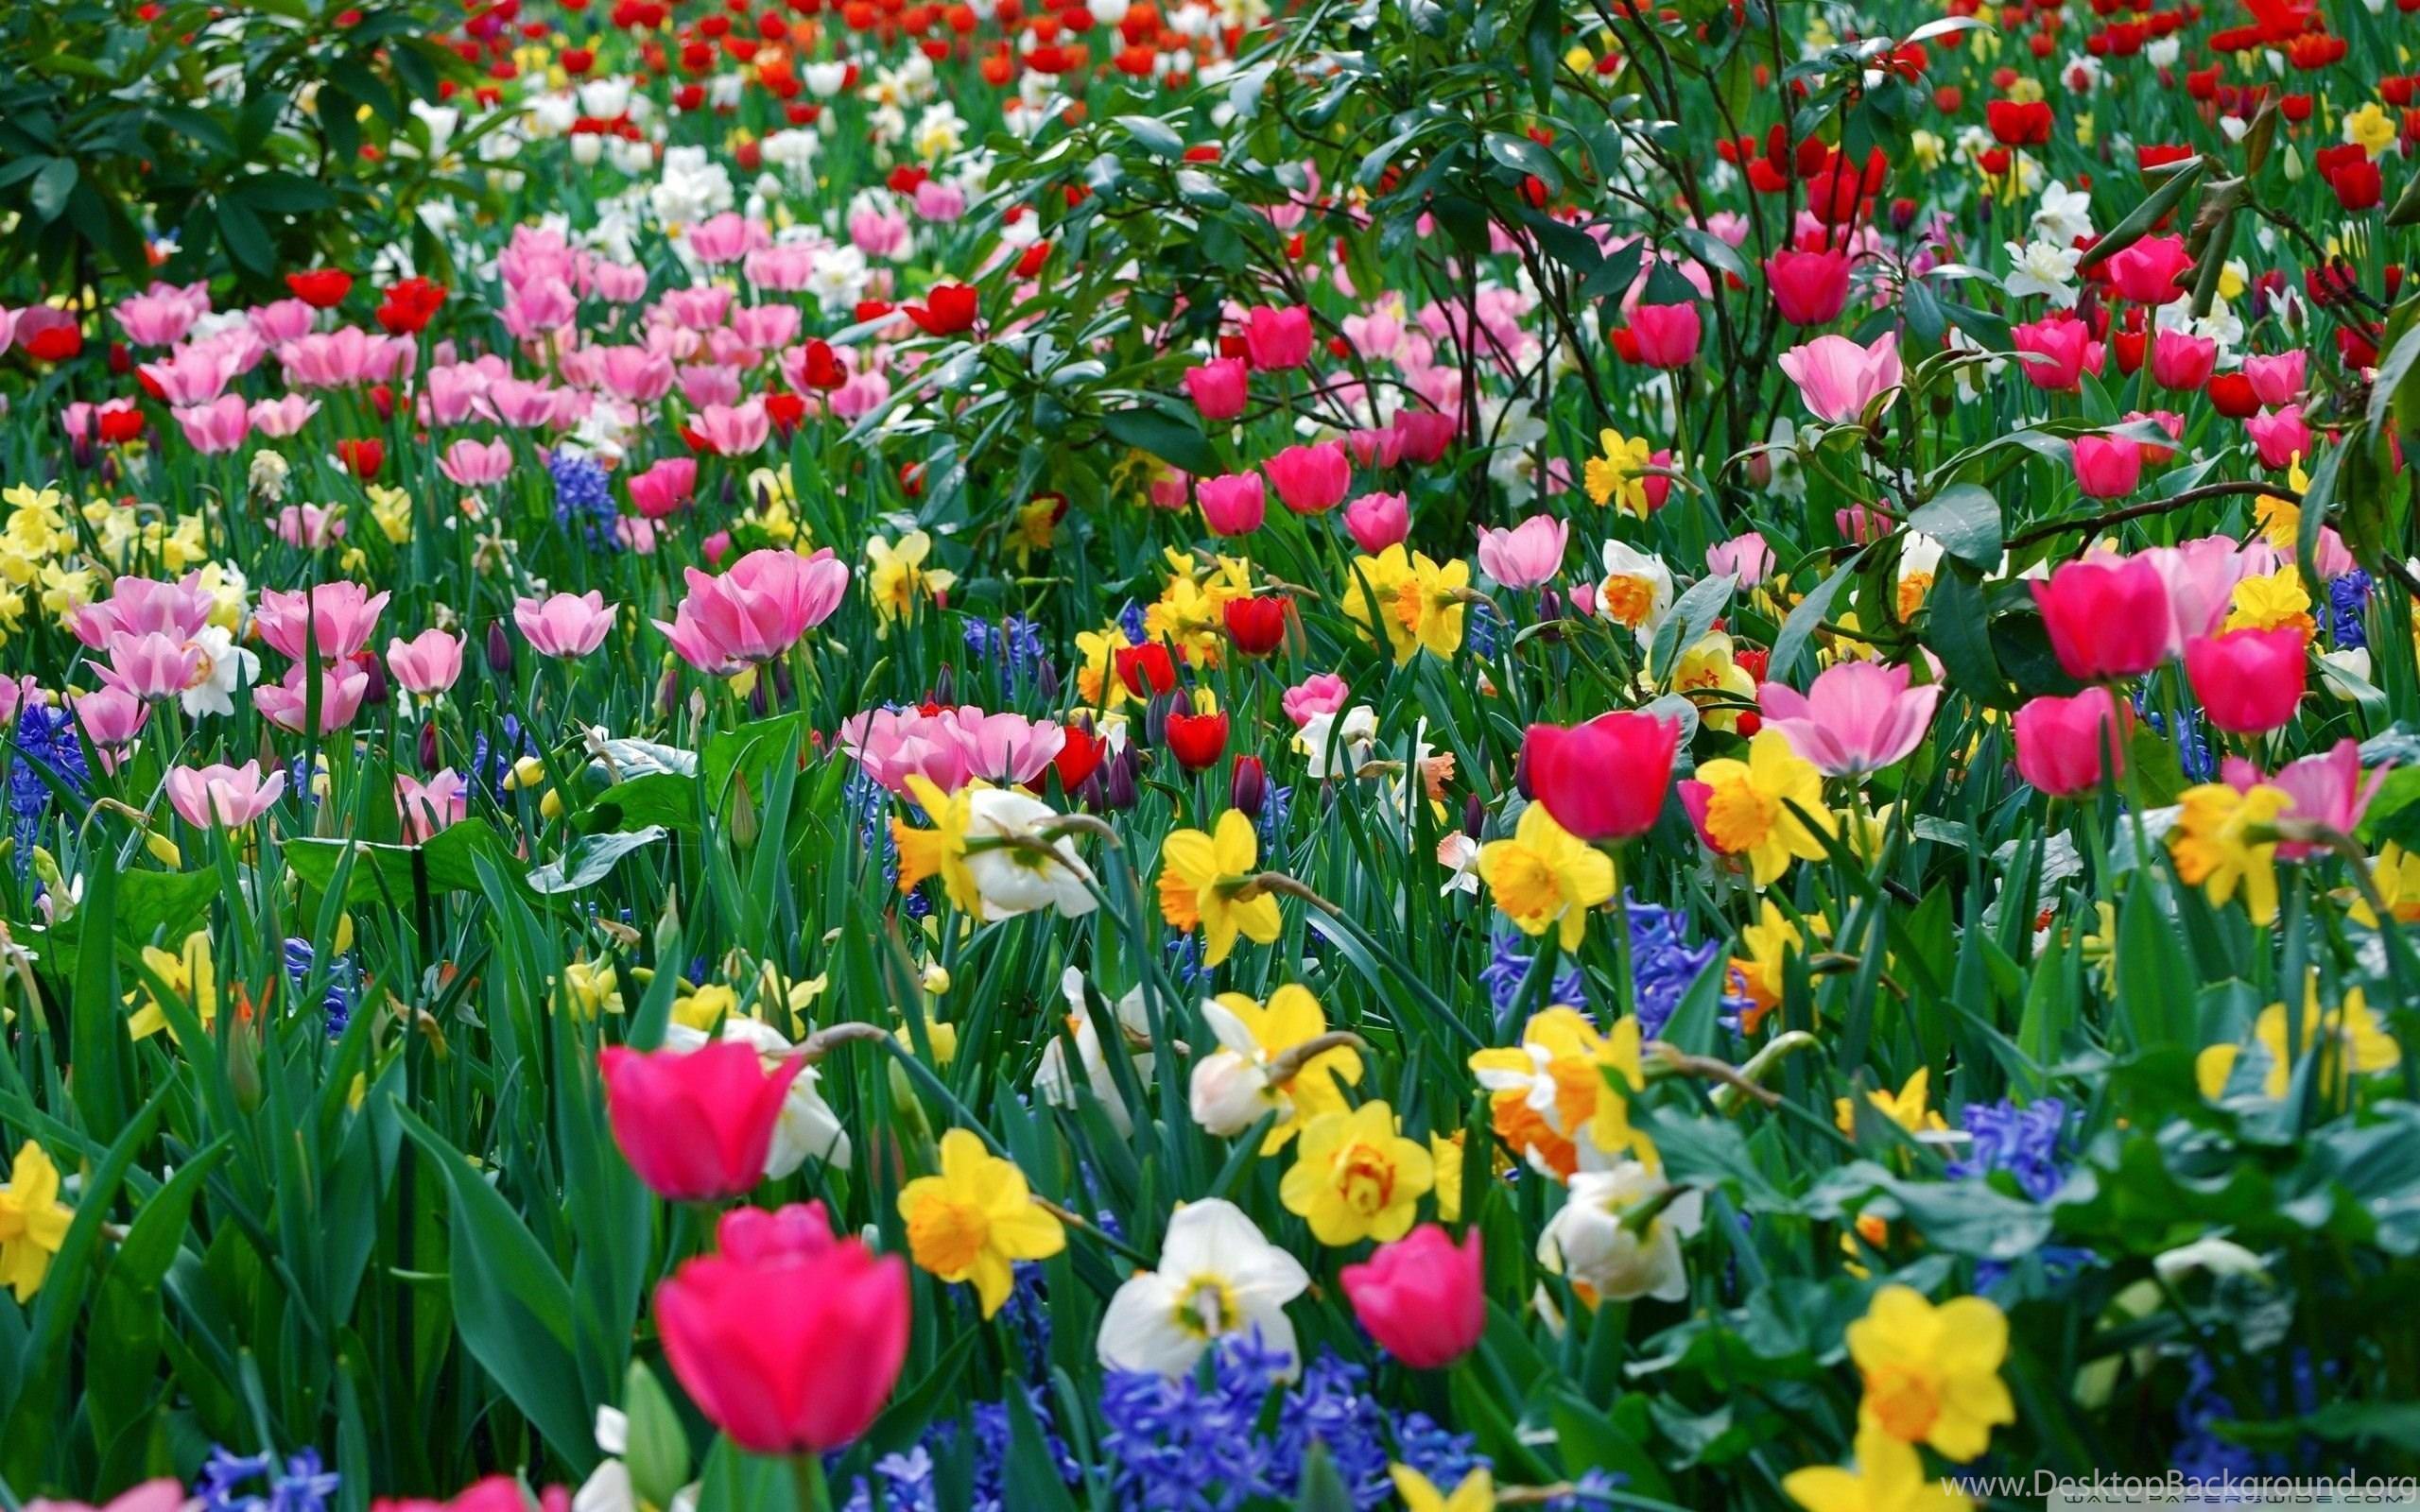 Top Spring Flowers Widescreen 1396 Images For Pinterest Desktop